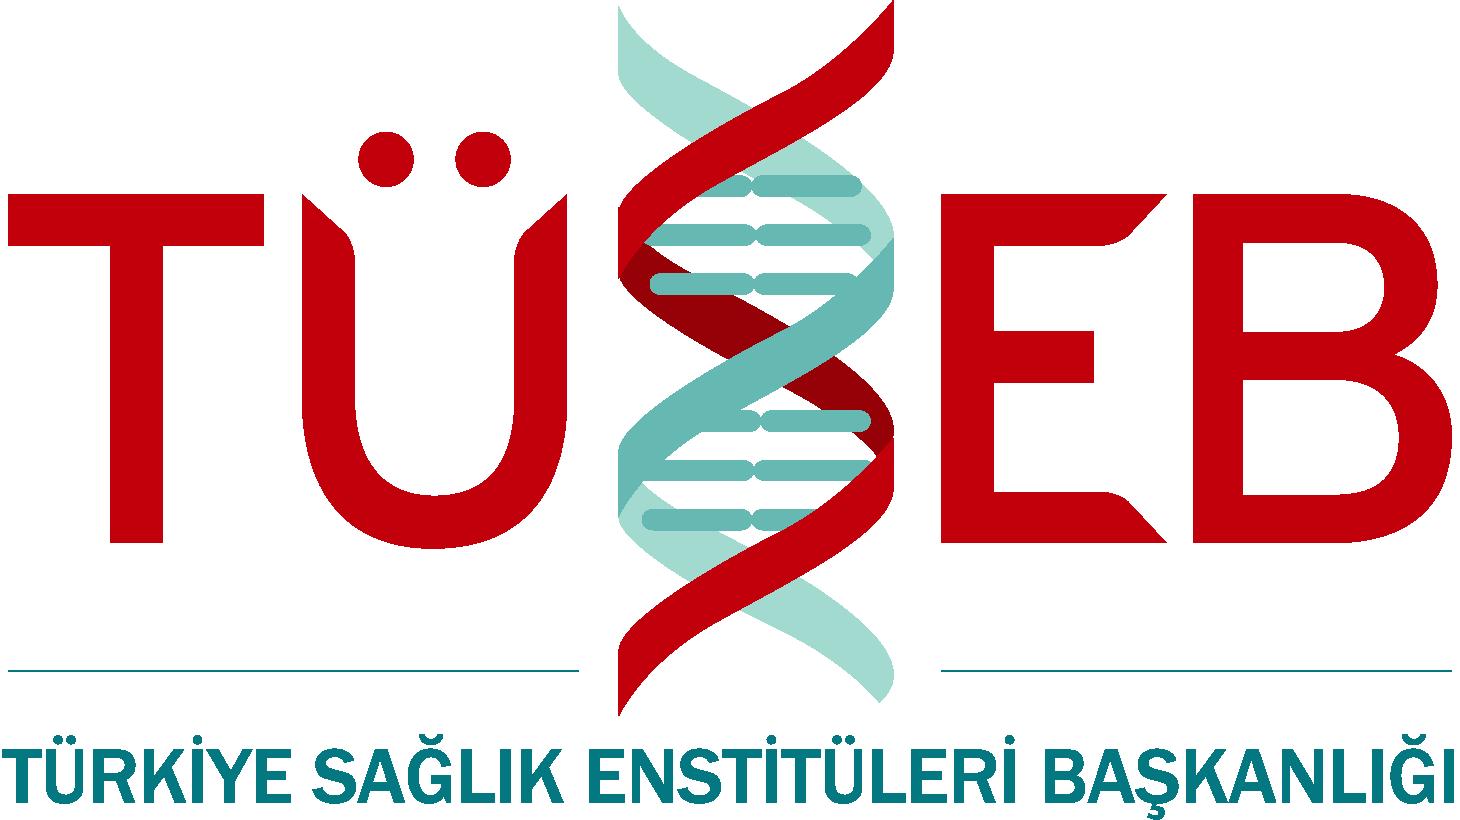 TÜSEB Logo png